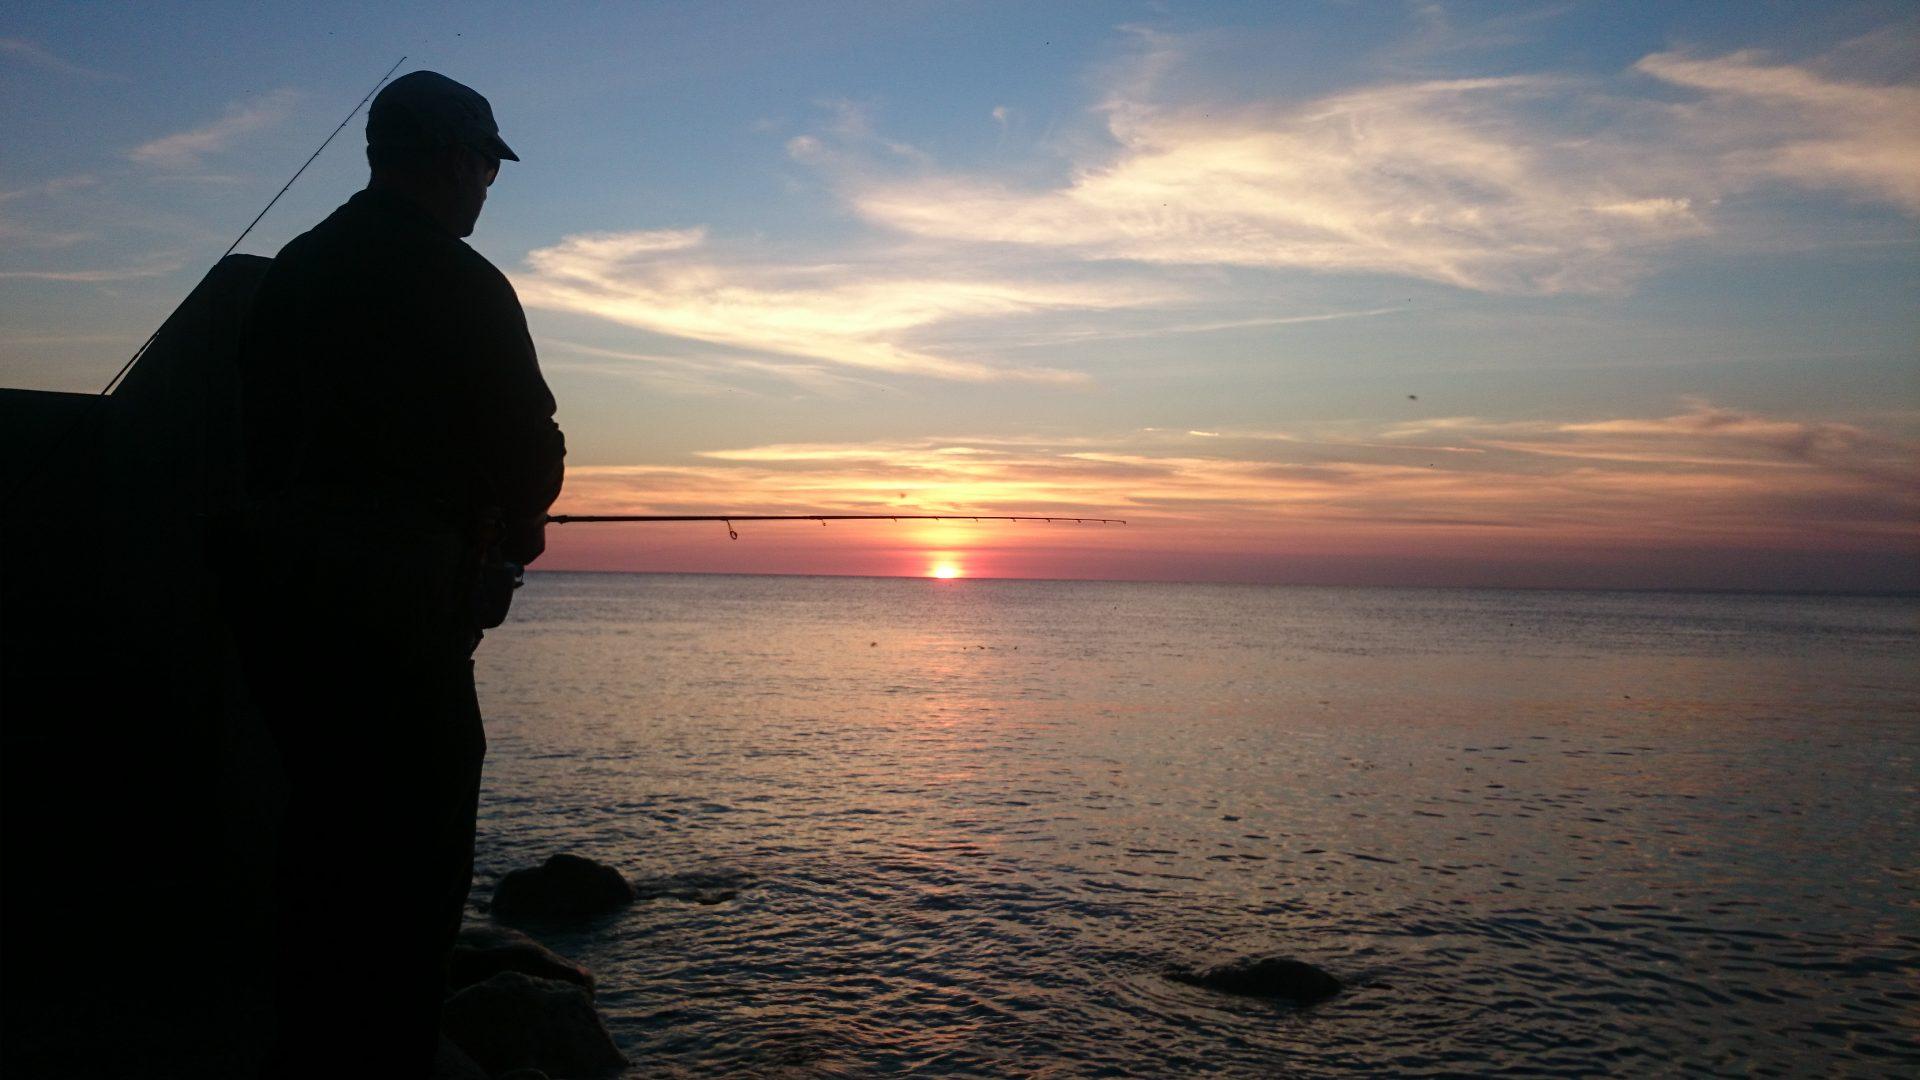 Ade sunset